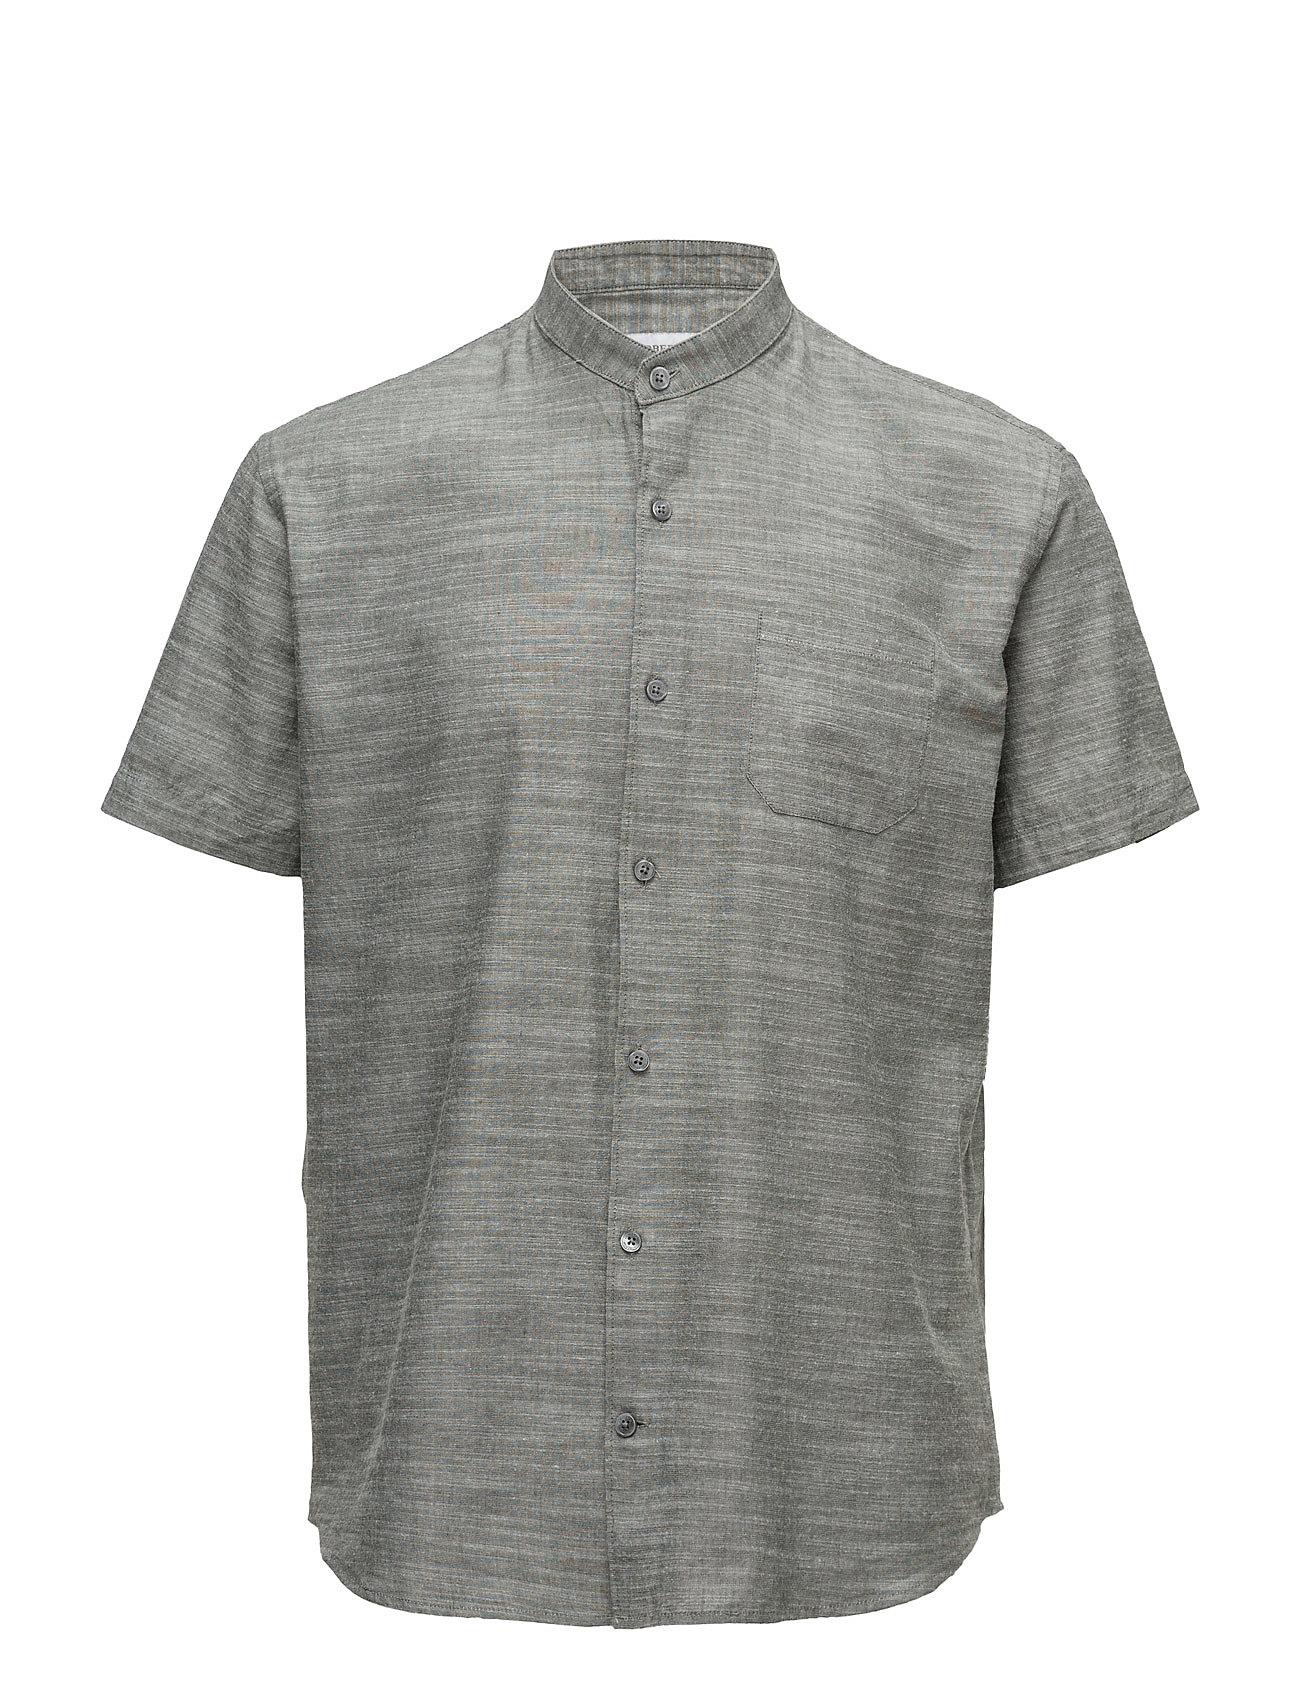 Mandarin Collar Shirt S/S Lindbergh Kortærmede til Herrer i